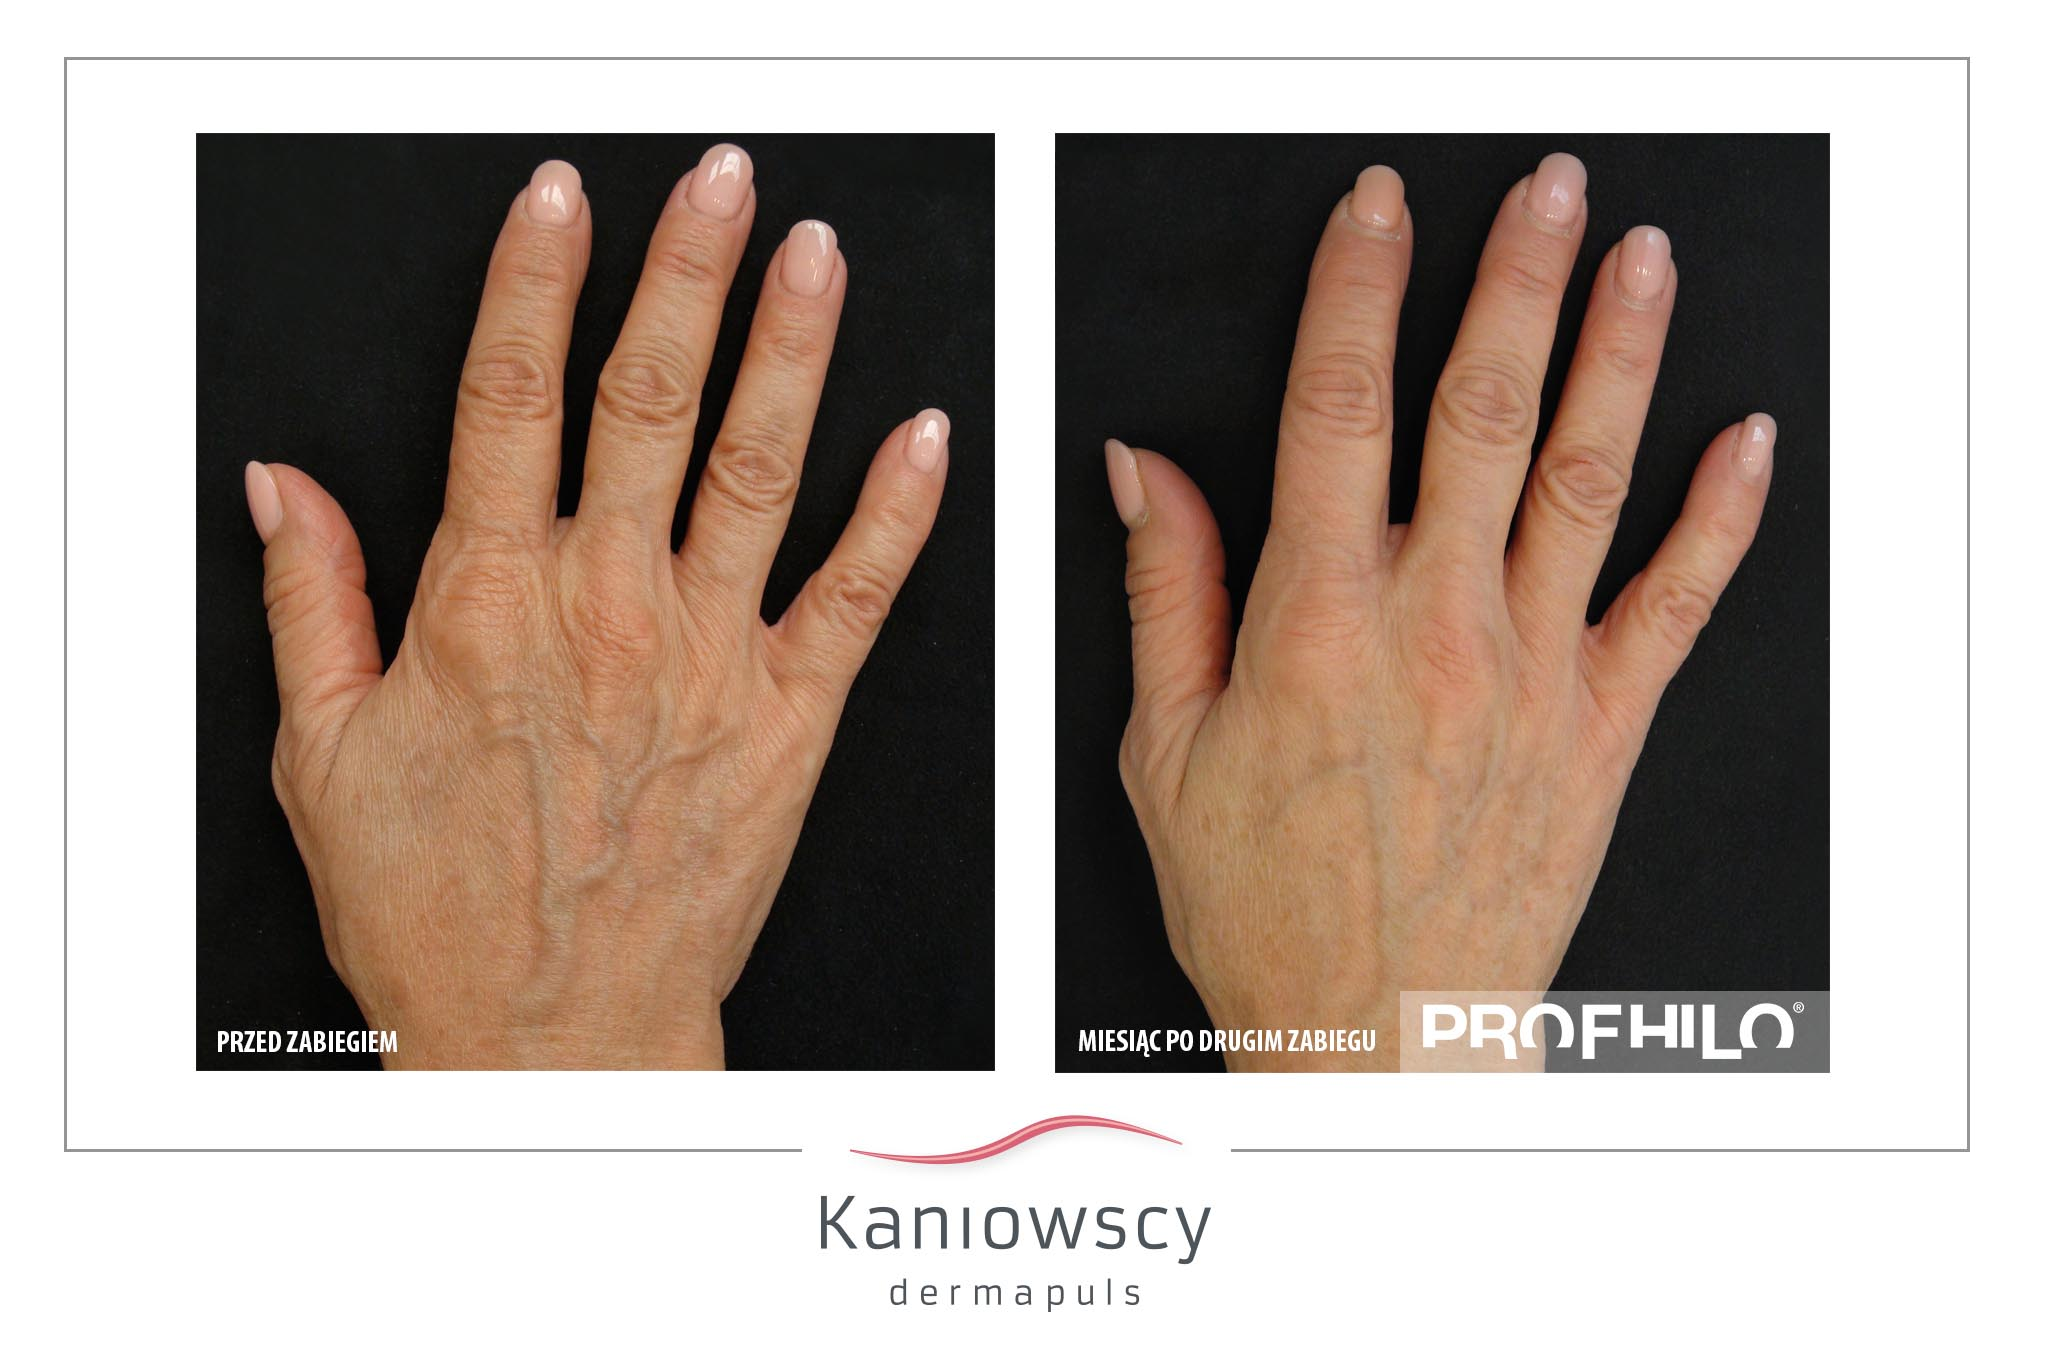 EFEKTY PROFHILO KANIOWSCY